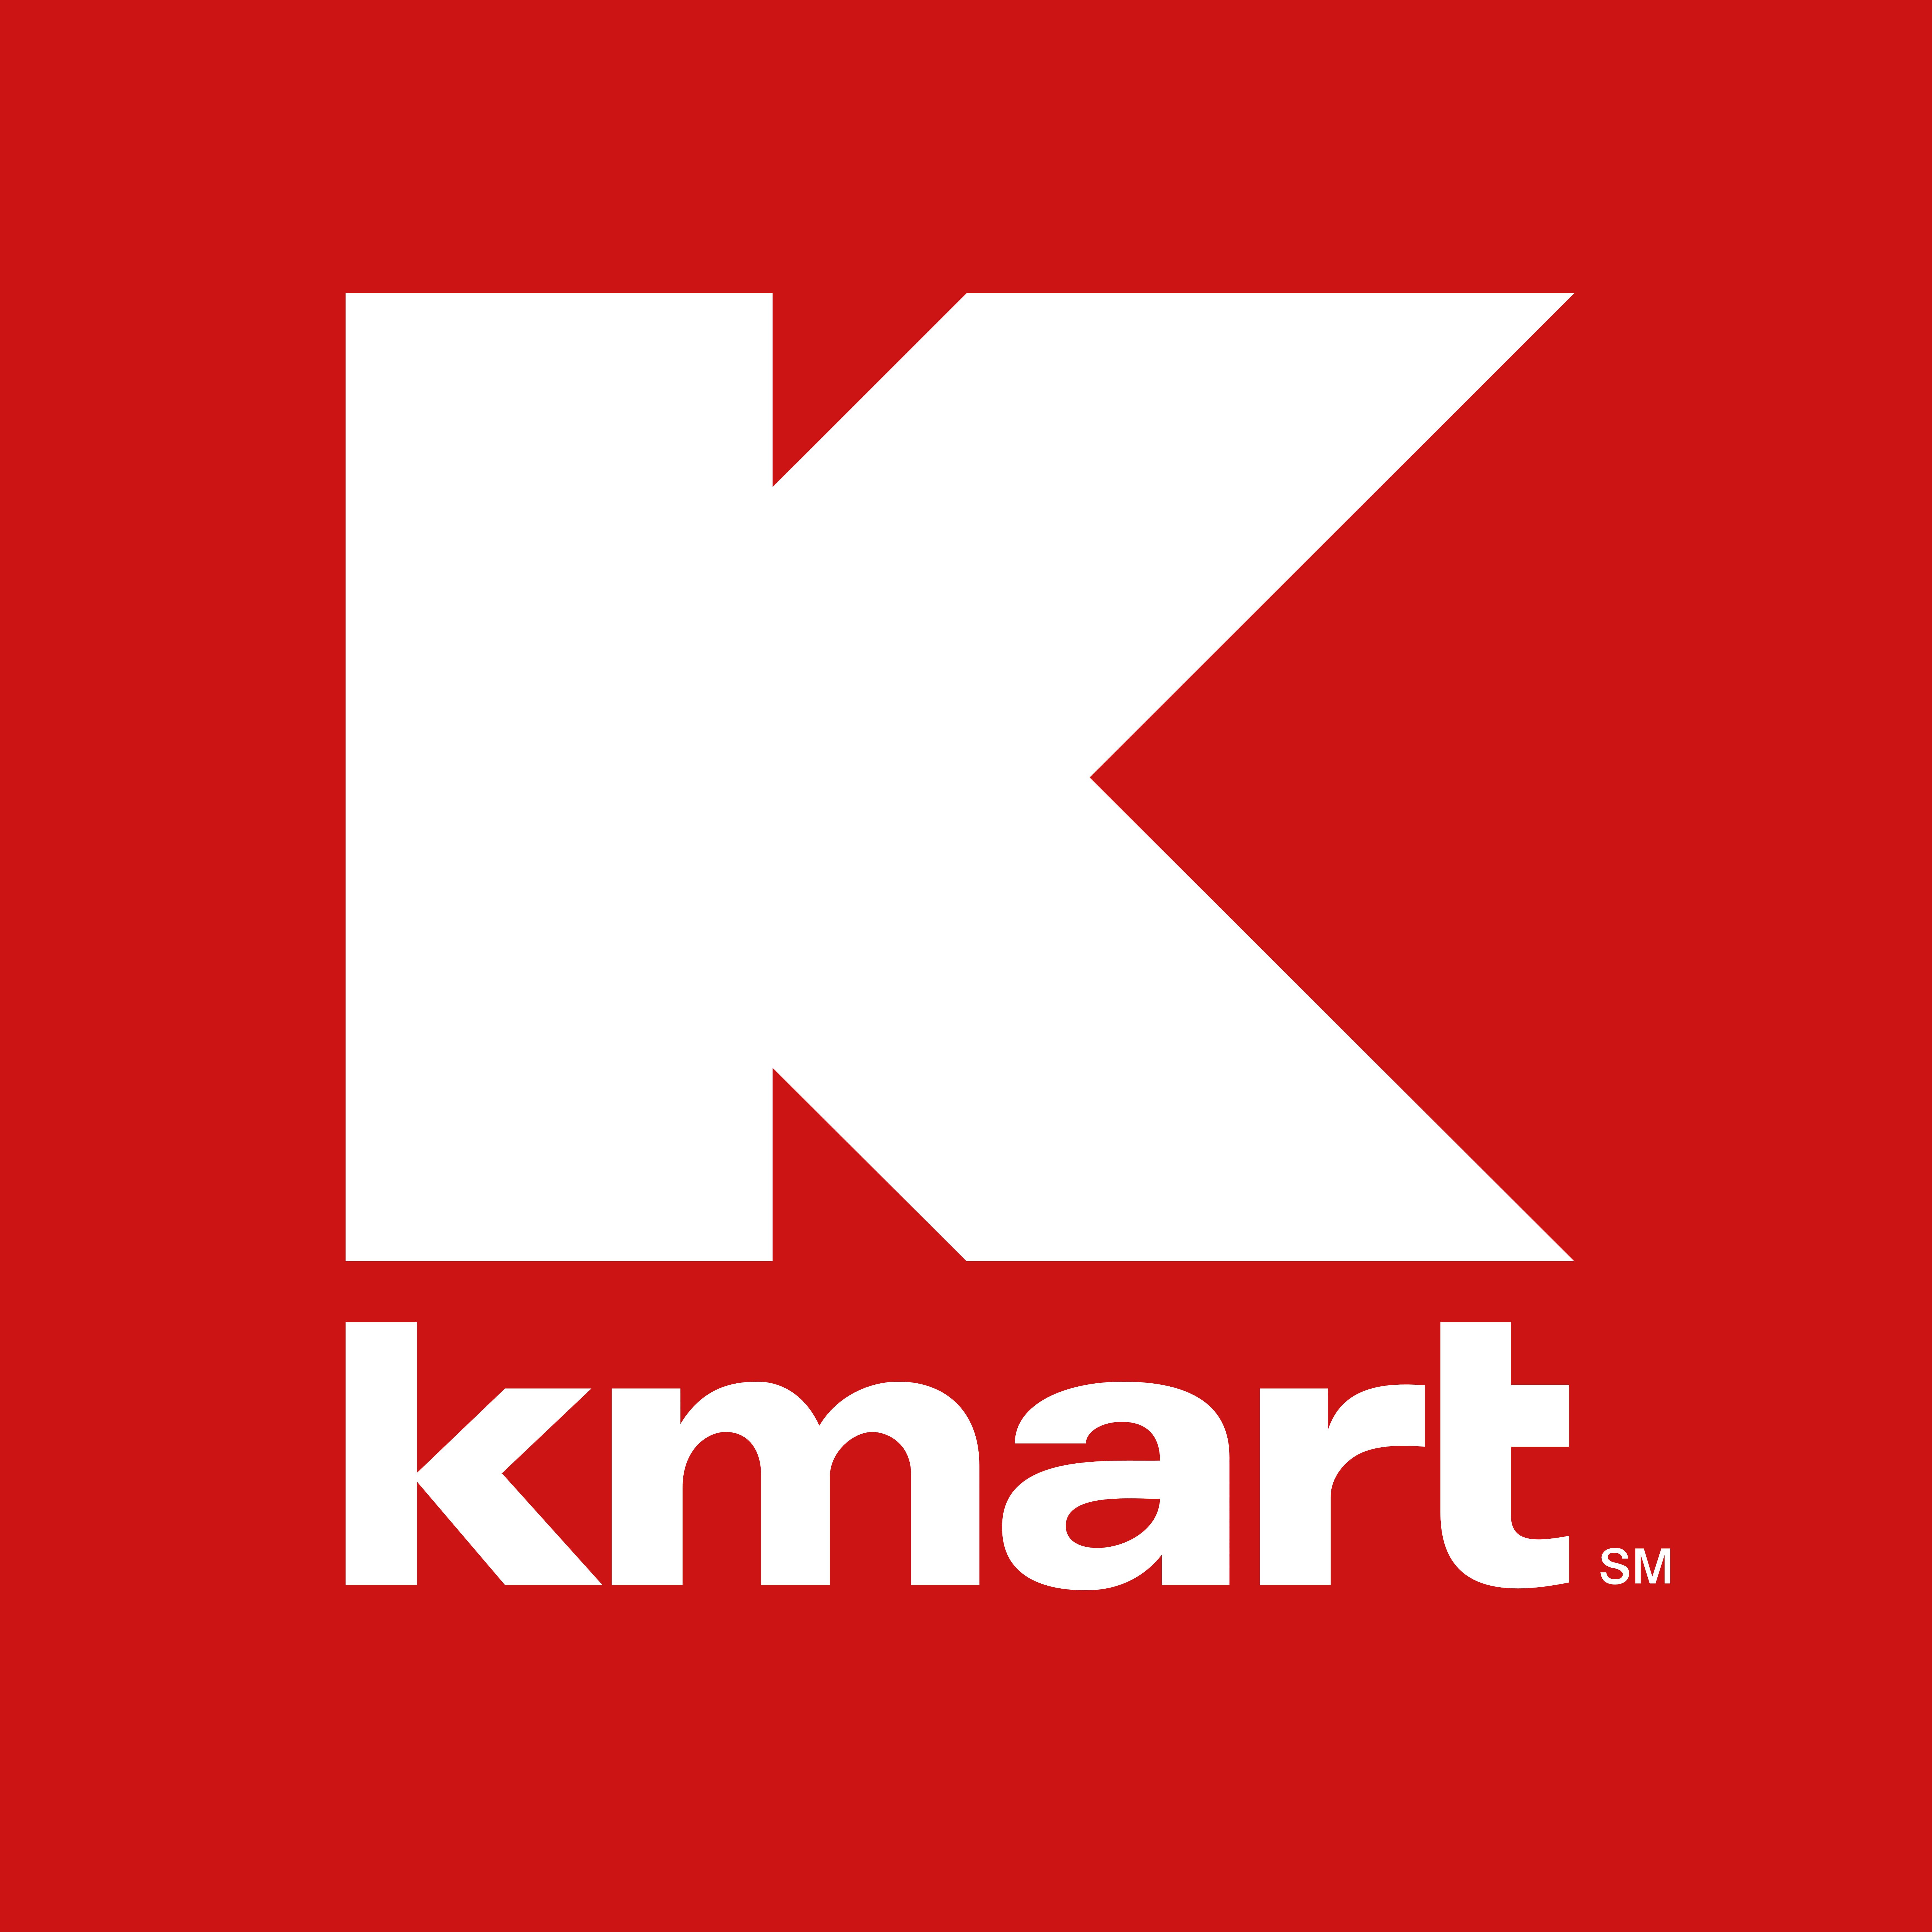 Kmart logo, red background.